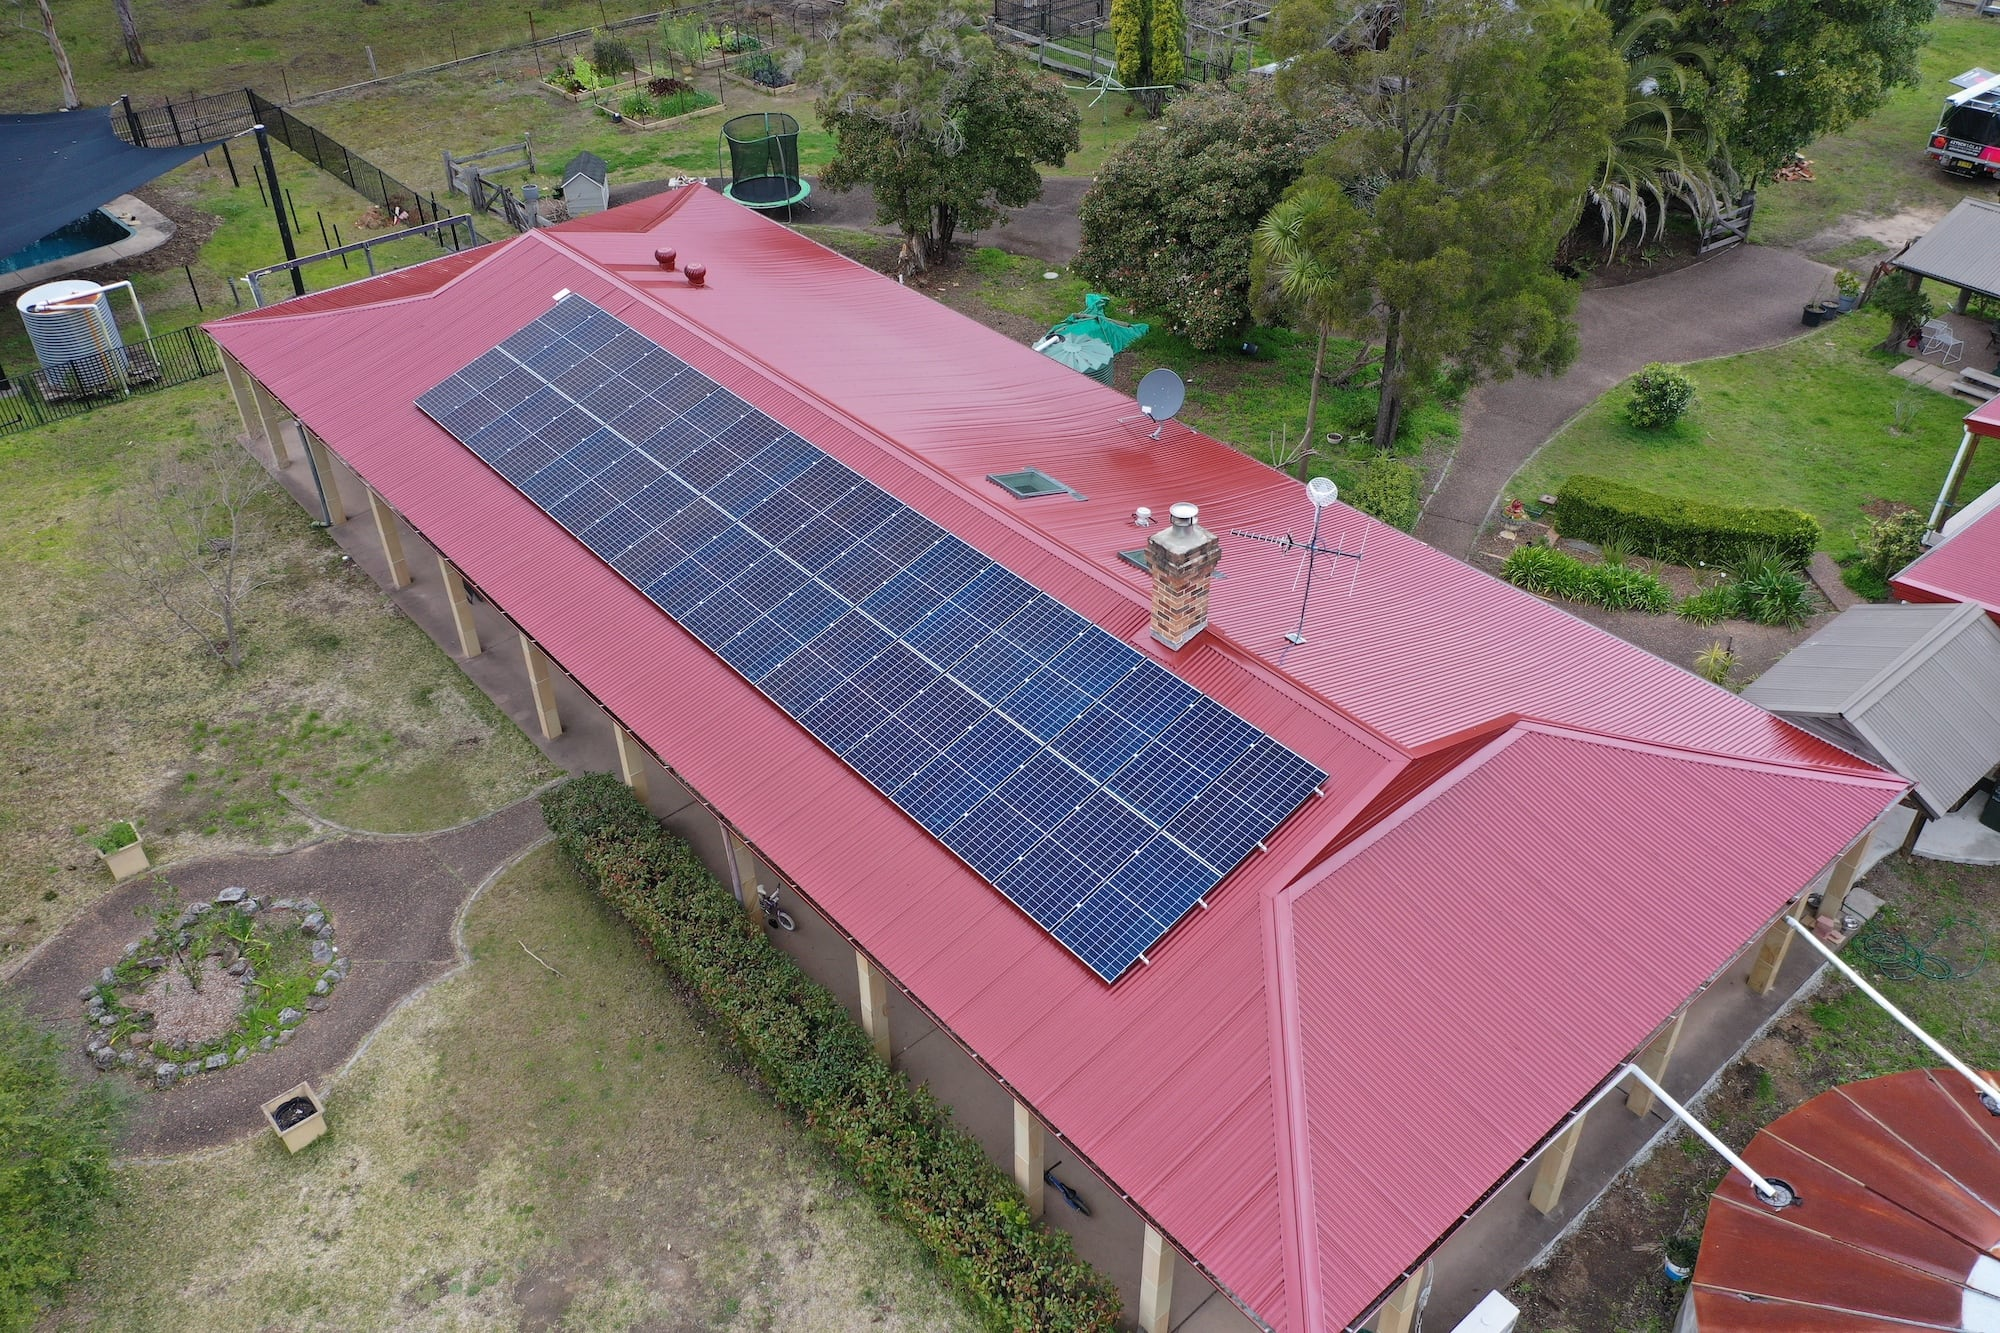 aztech solar panel installation_august 14